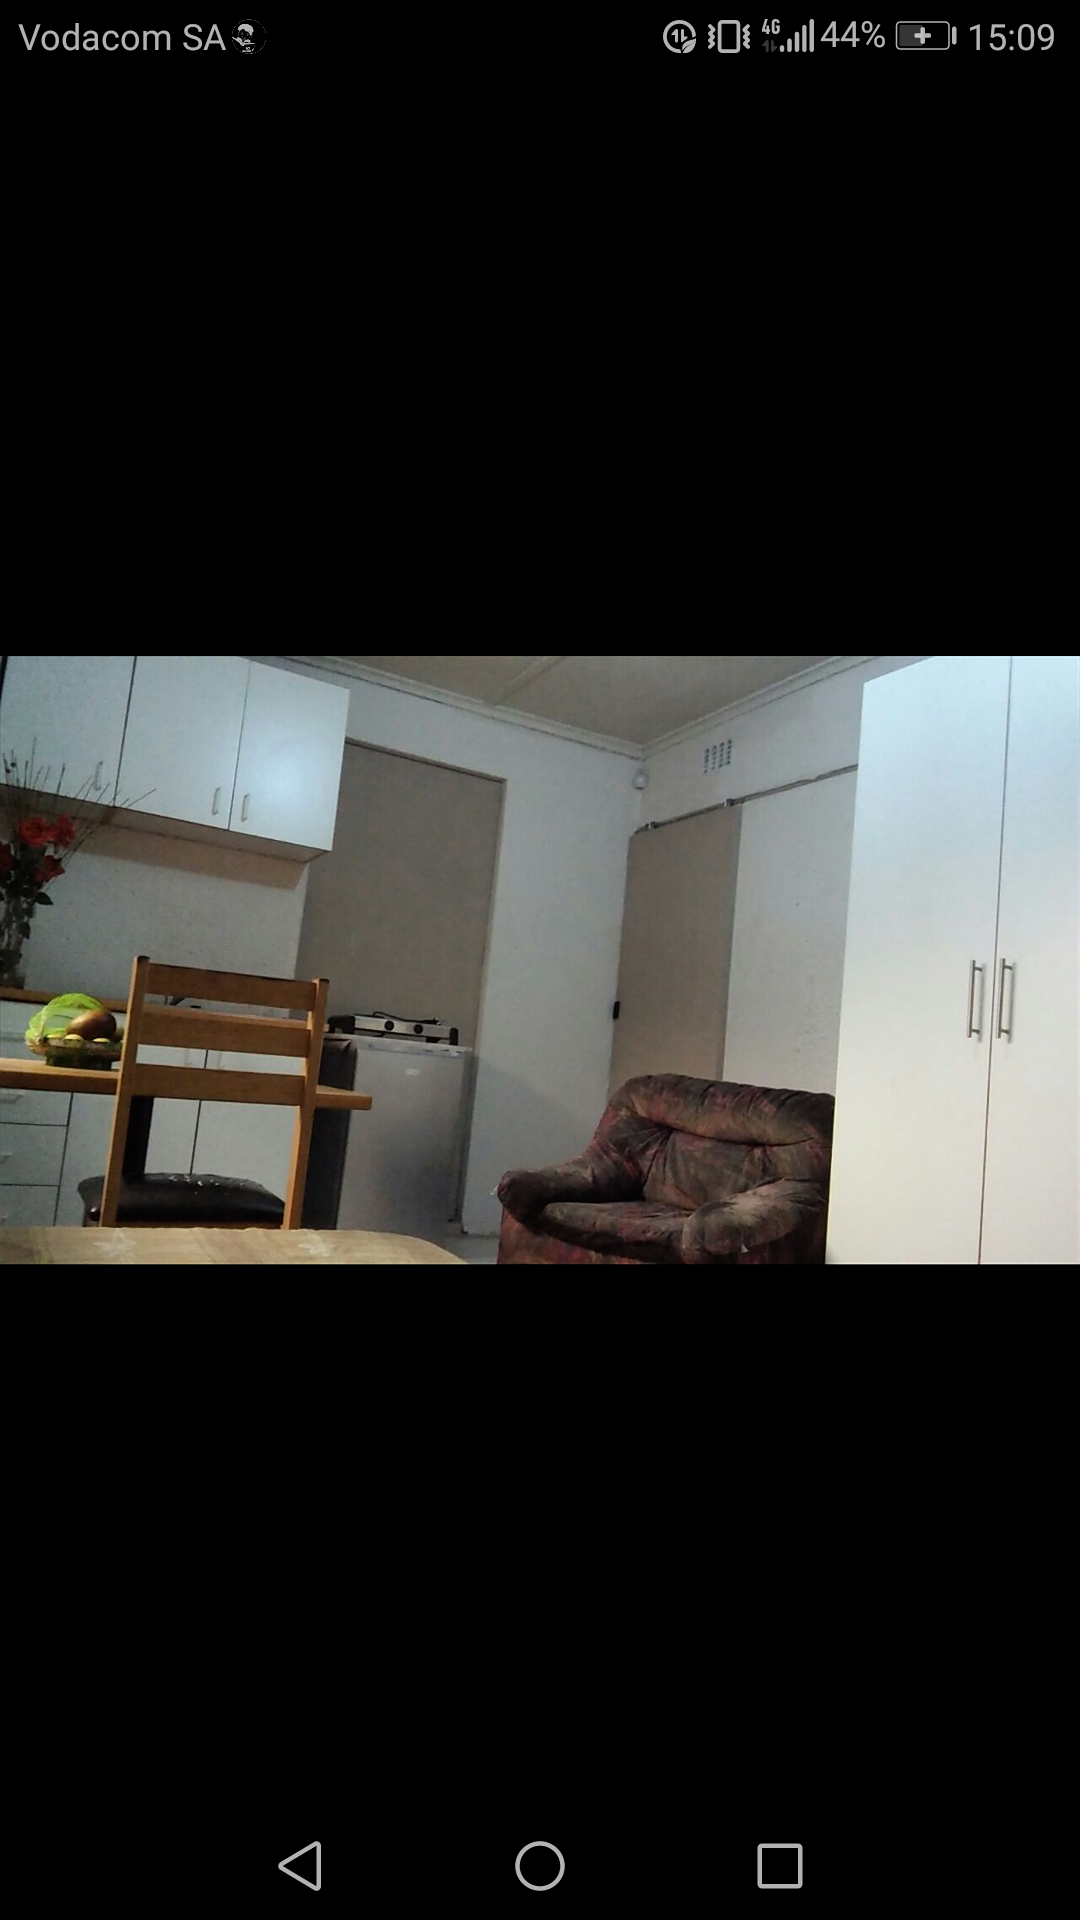 Furnished,1 bedroom student/separate entrance,spacious,SecureInBelthorn/Crawford